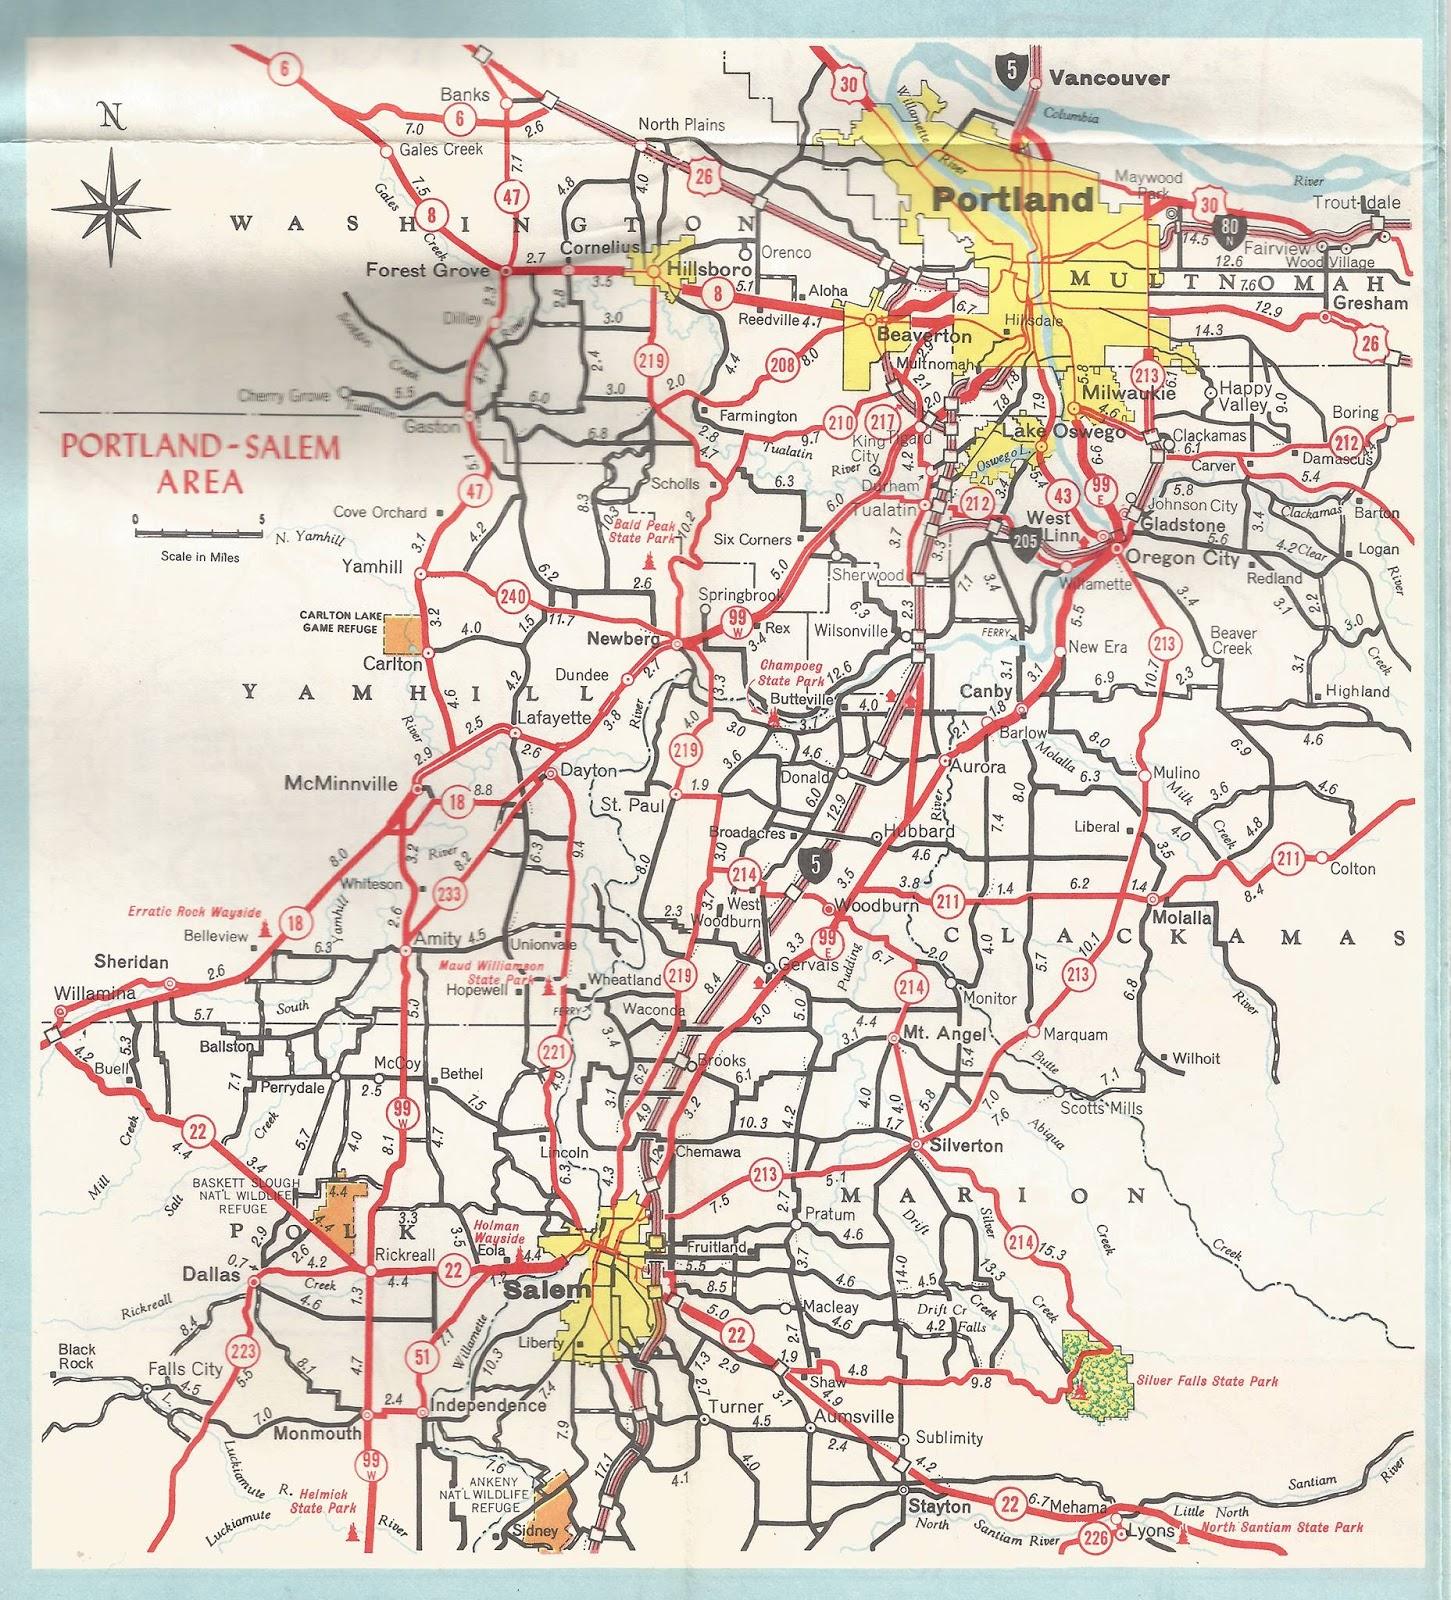 The ZehnKatzen Times: [OR_liff] Portland-Salem Area Map, From ODOT, 1971